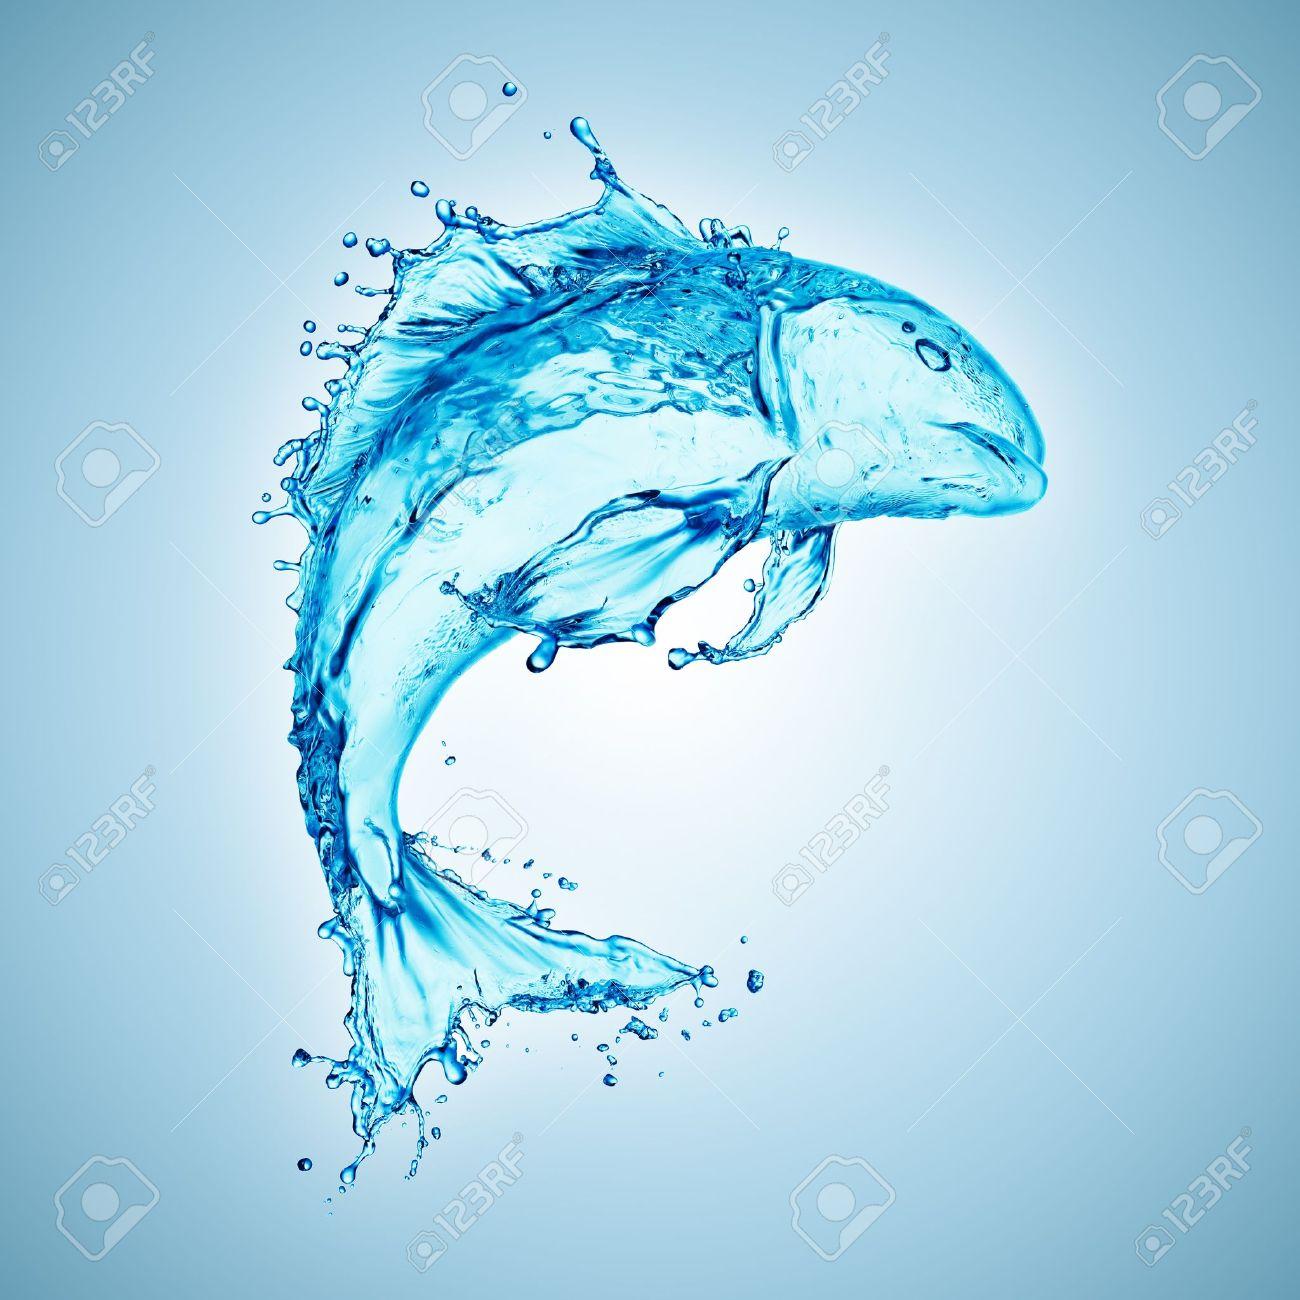 water fish splash isolated on white background - 12770448